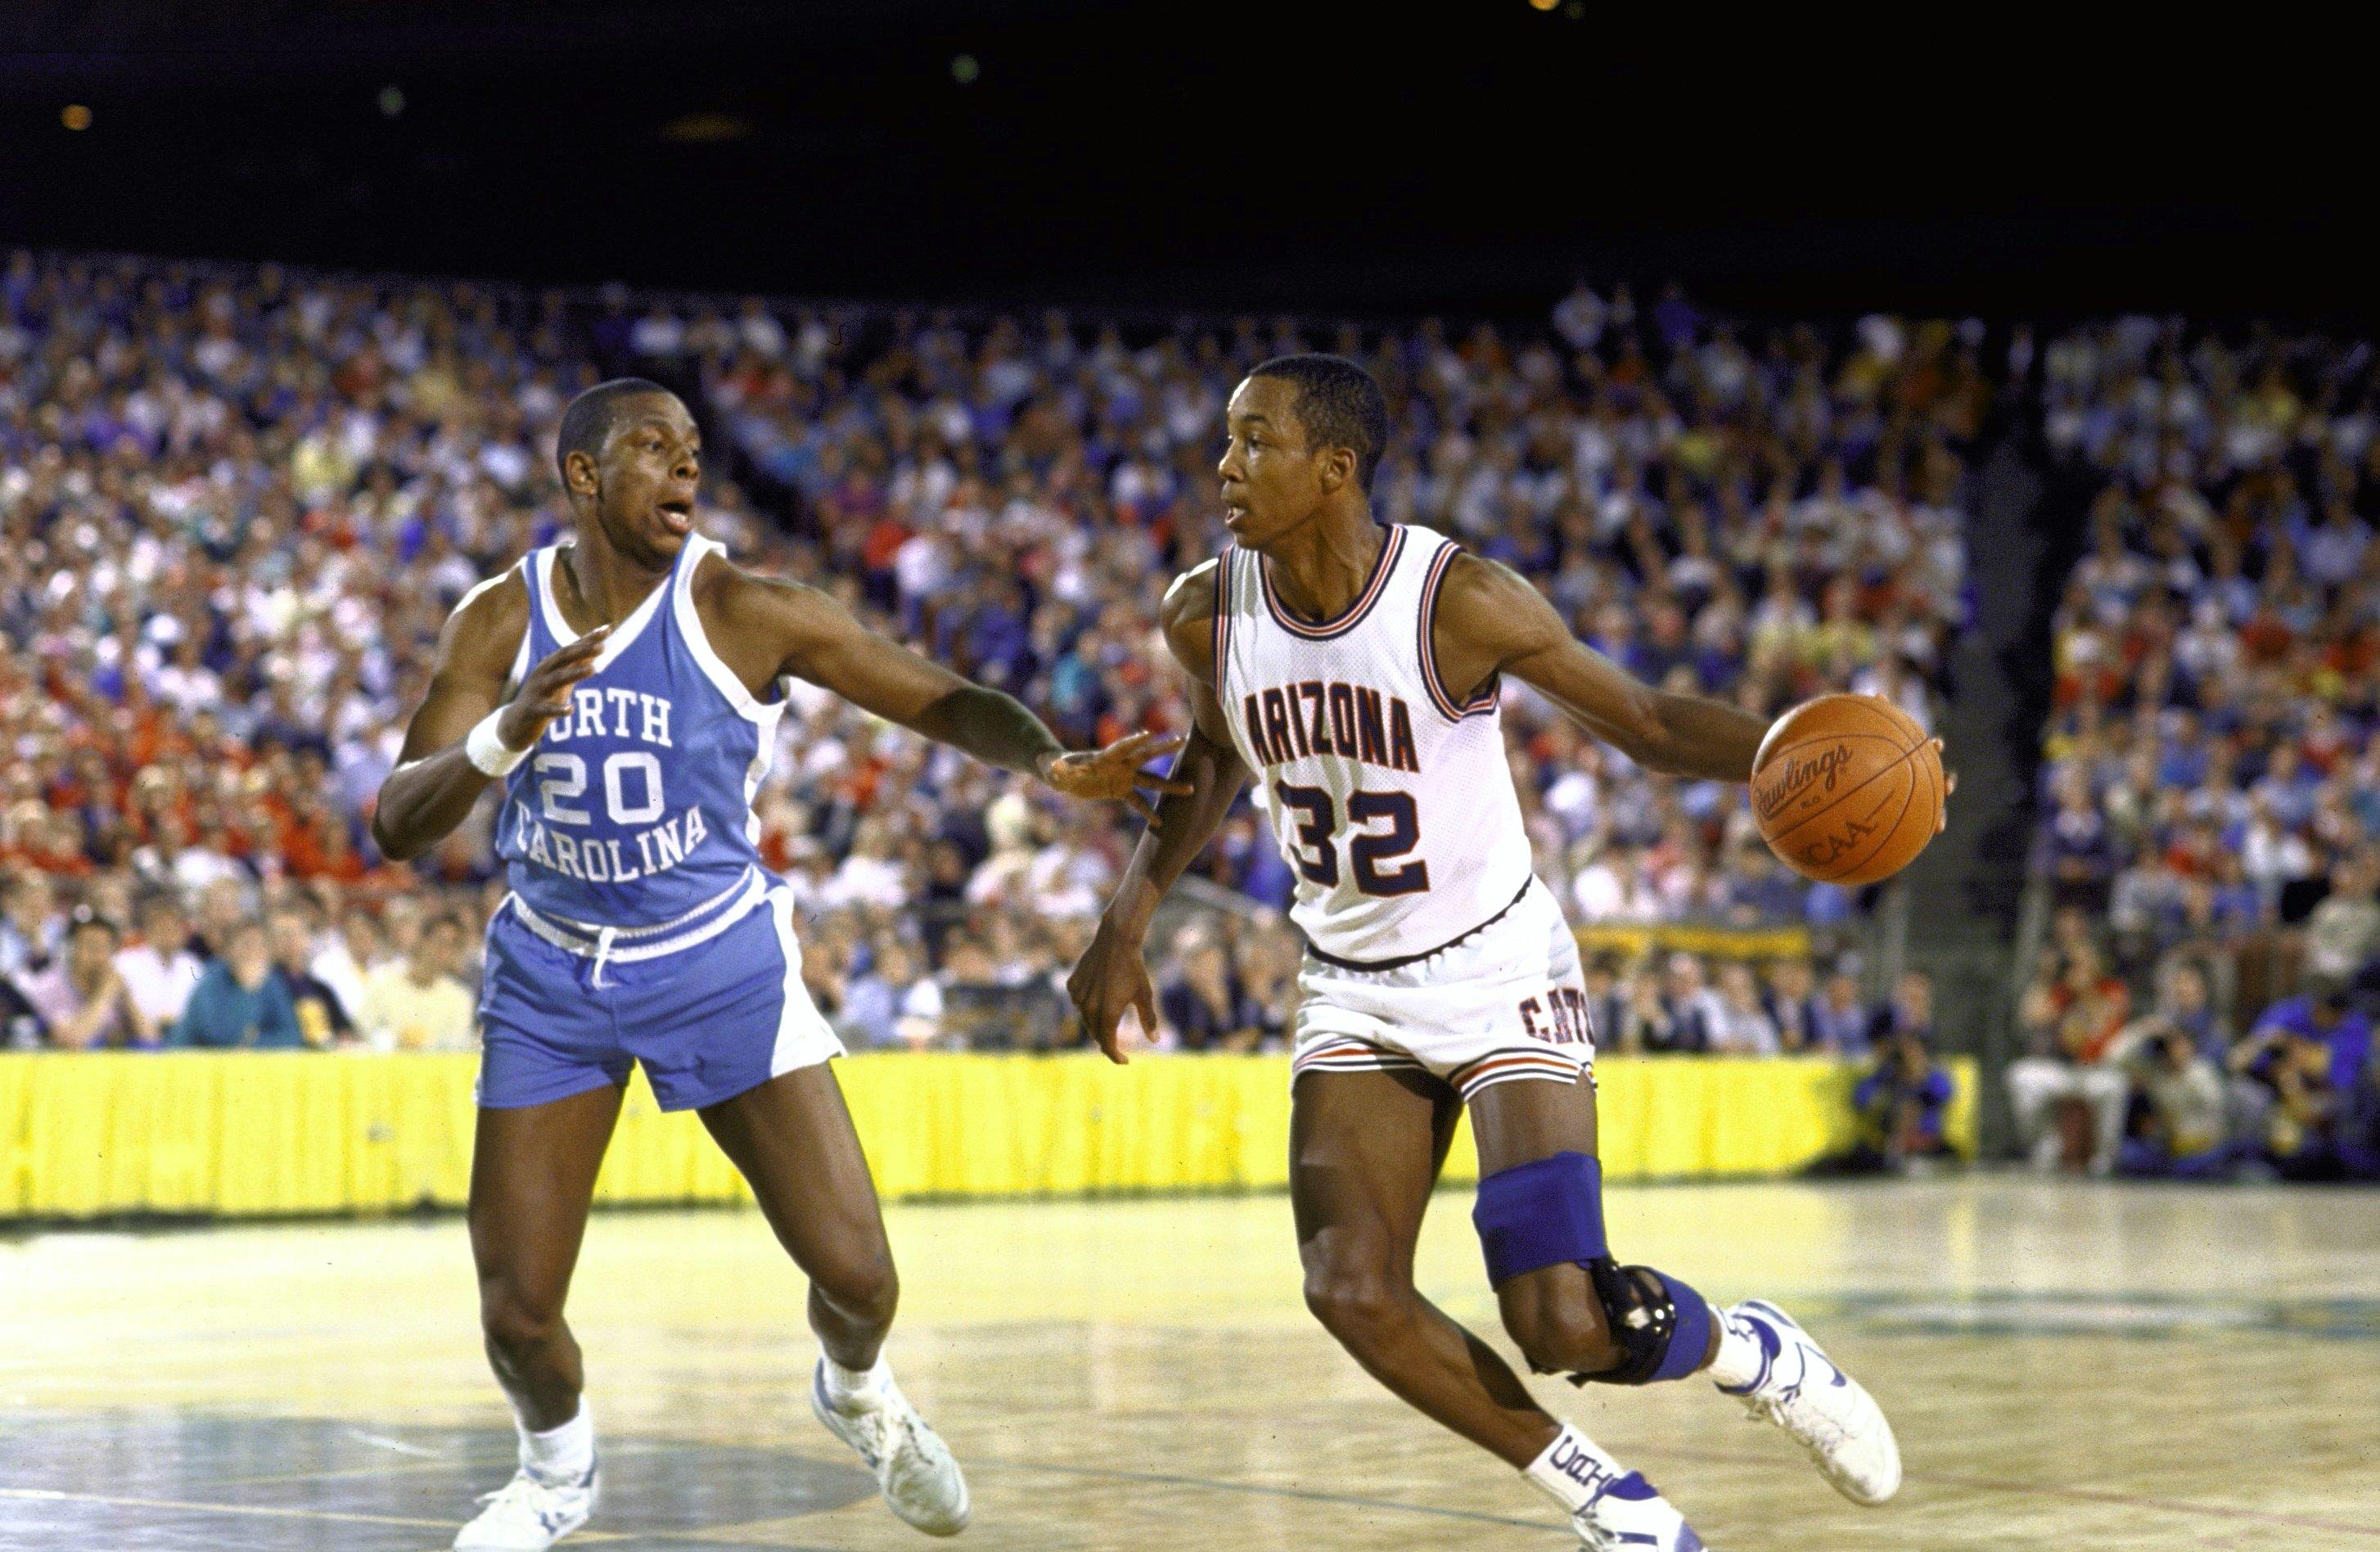 University of Arizona vs University of North Carolina, 1988 NCAA West Regional Finals